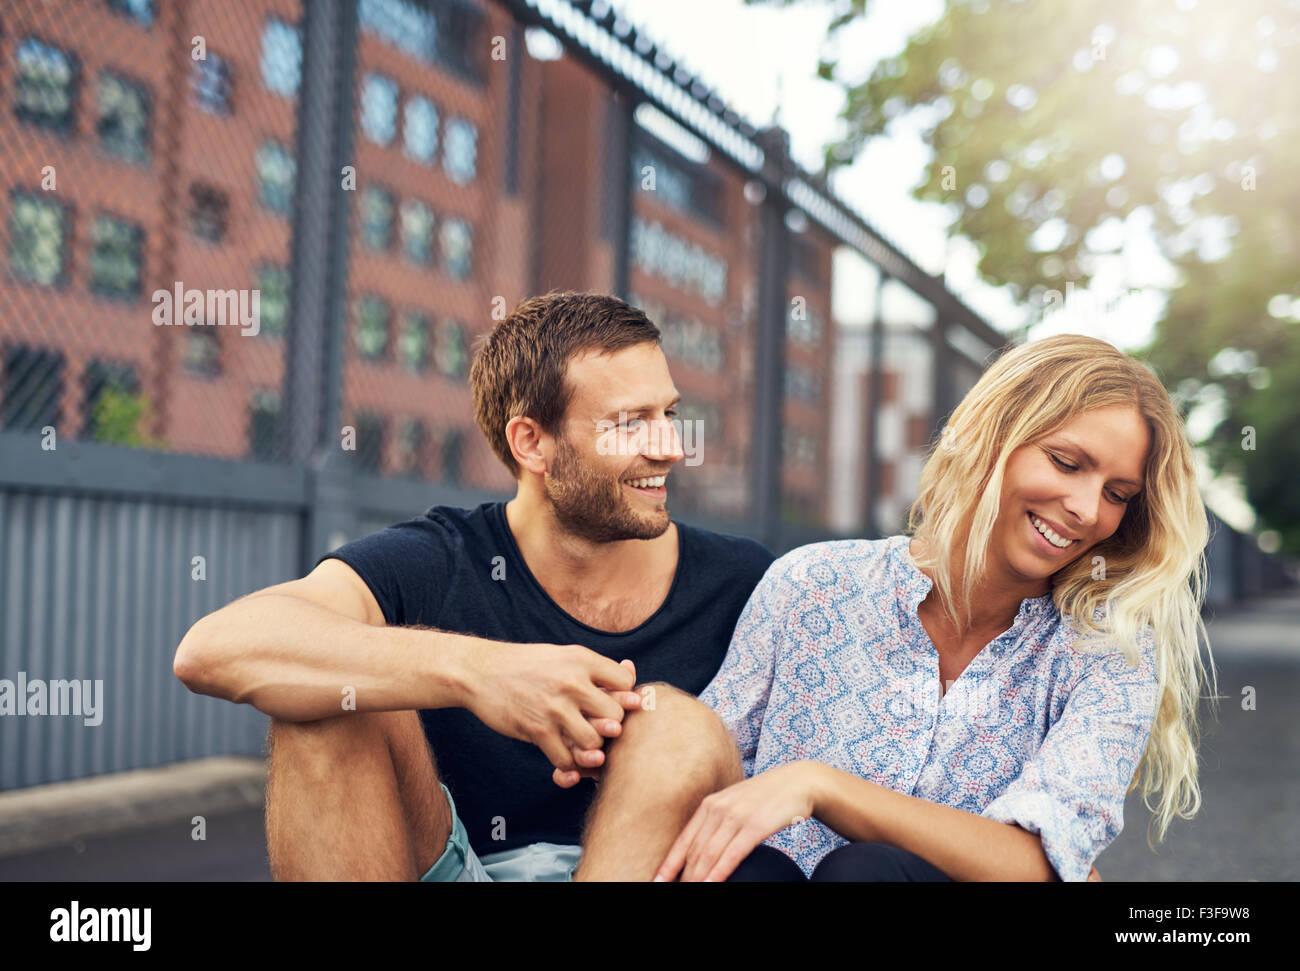 Taquiner l'homme à sa petite amie, grande ville couple in a park Photo Stock